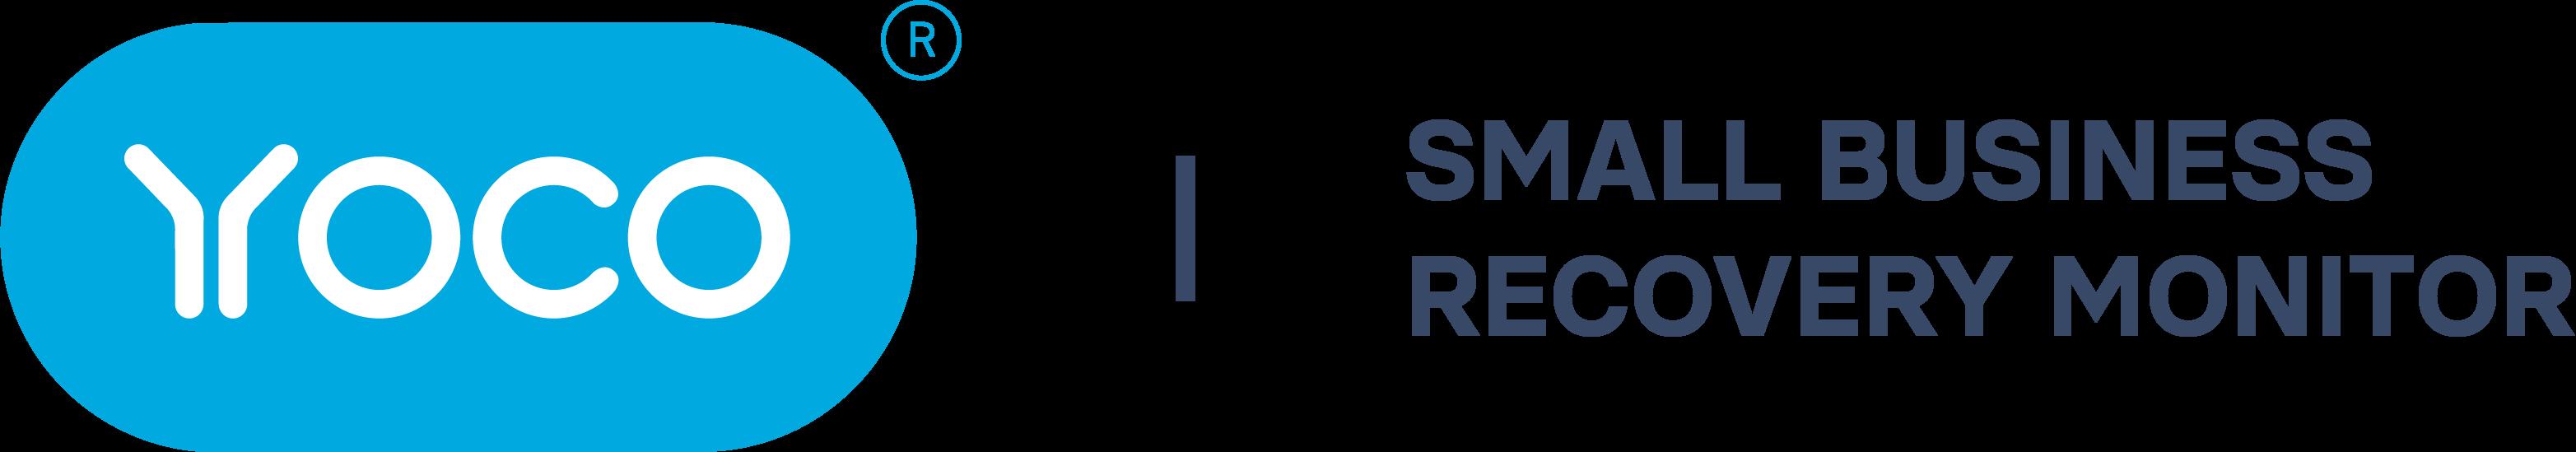 Yoco_small_business_recovery_logo@4x-8